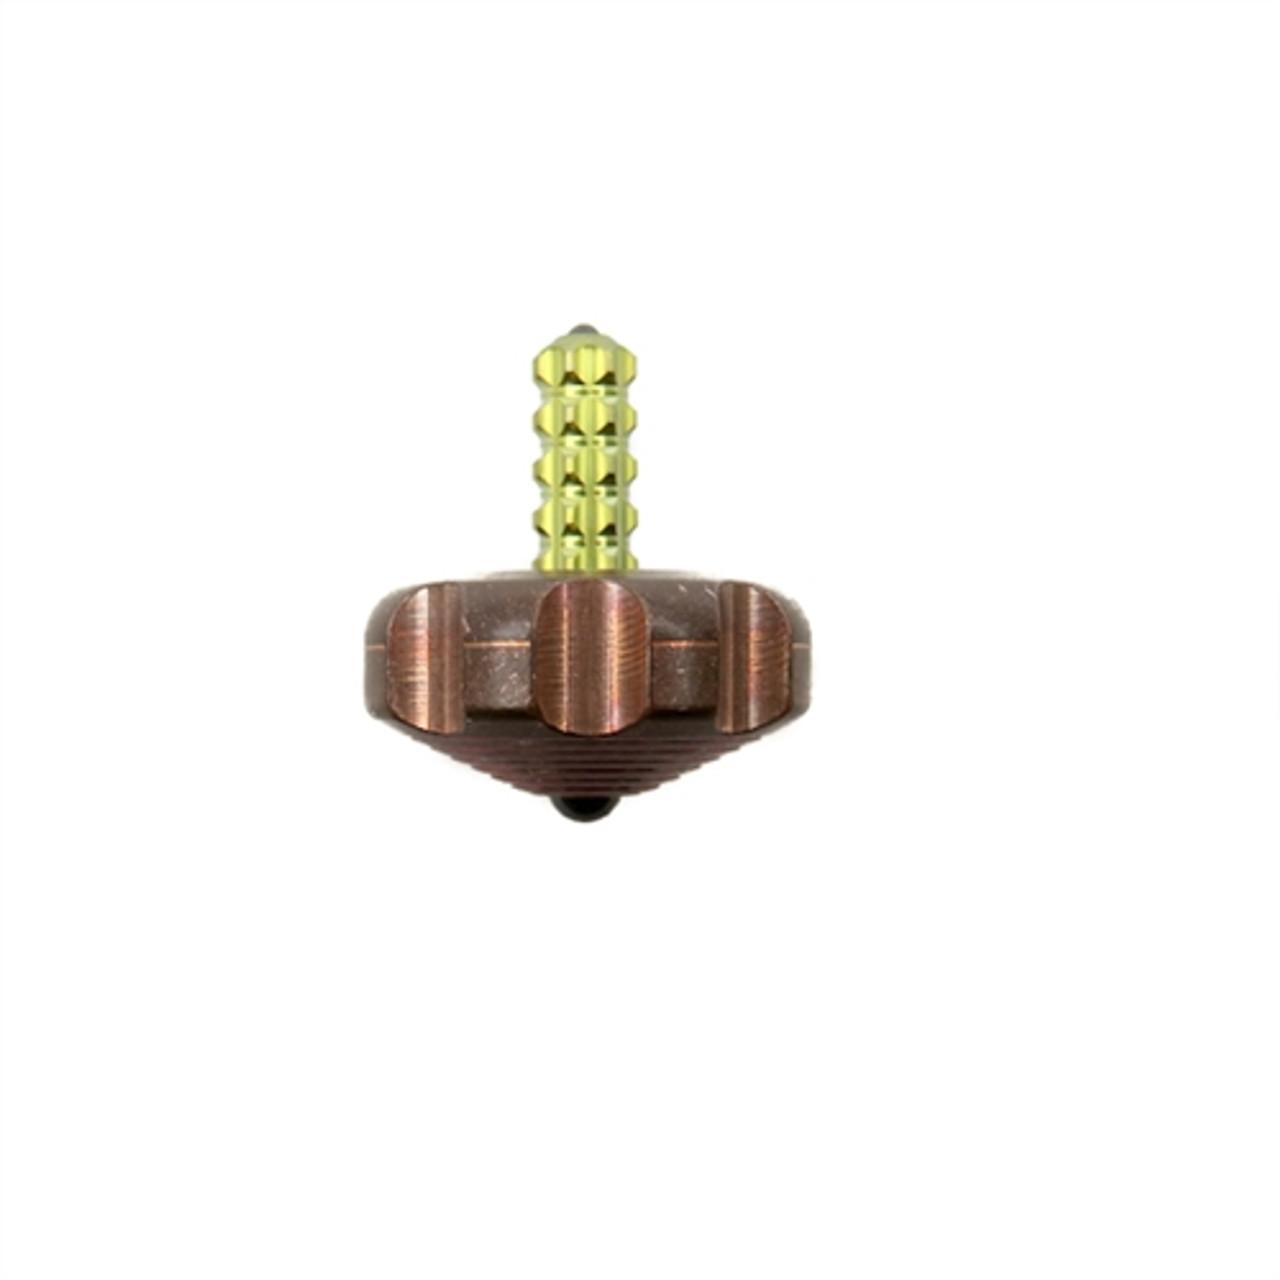 Marfione Custom Knives Copper Mini Spin Top, Gold Titanium Stem